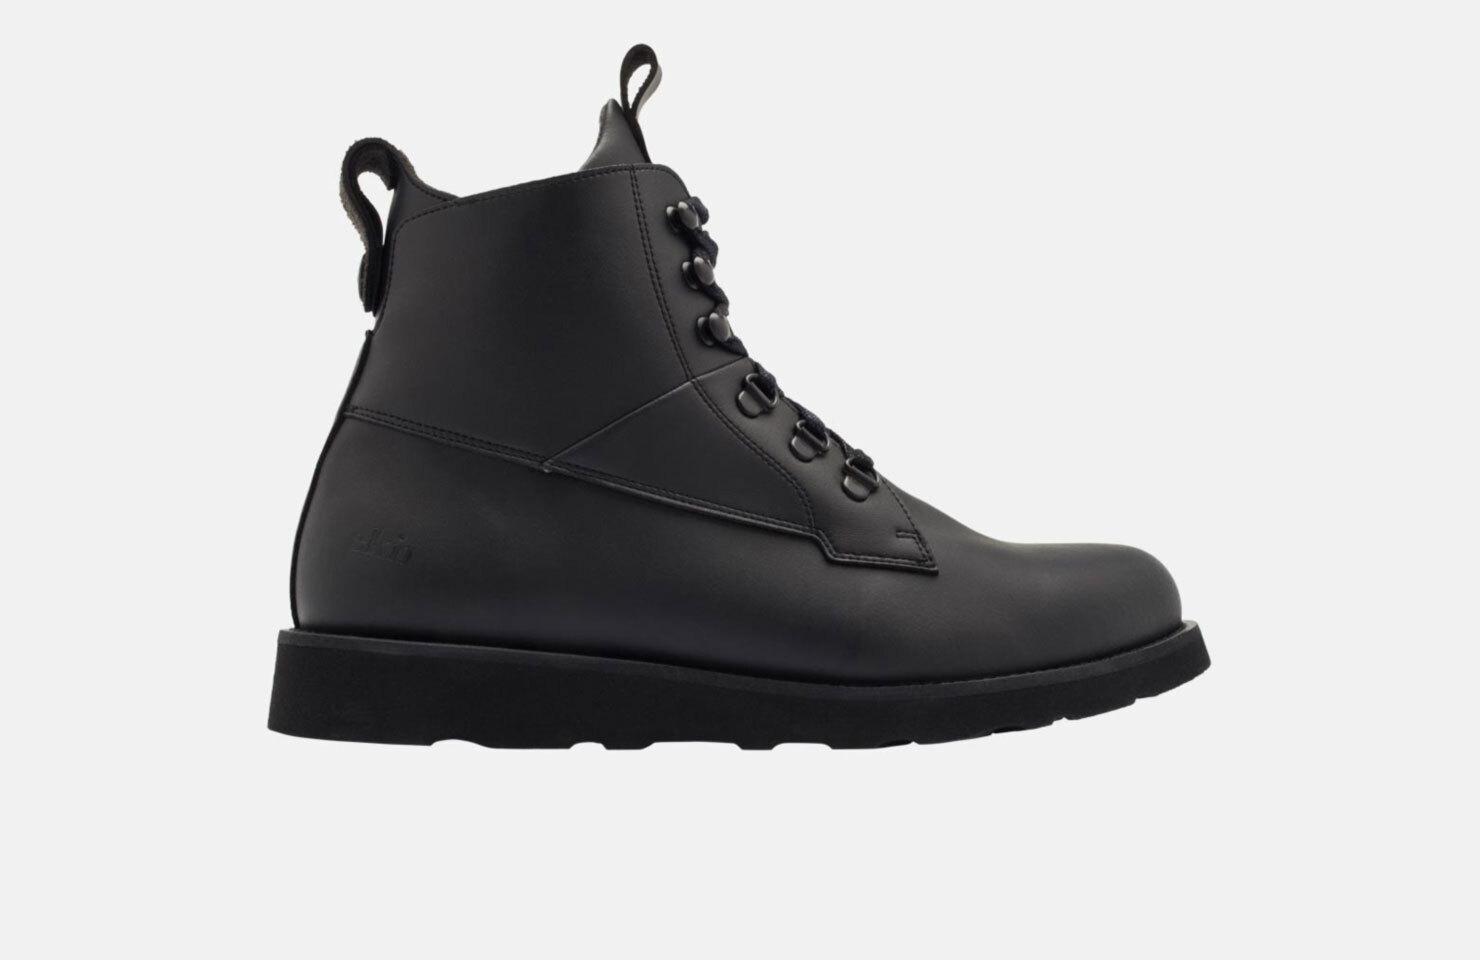 Cedar Boot / All Black Vegan